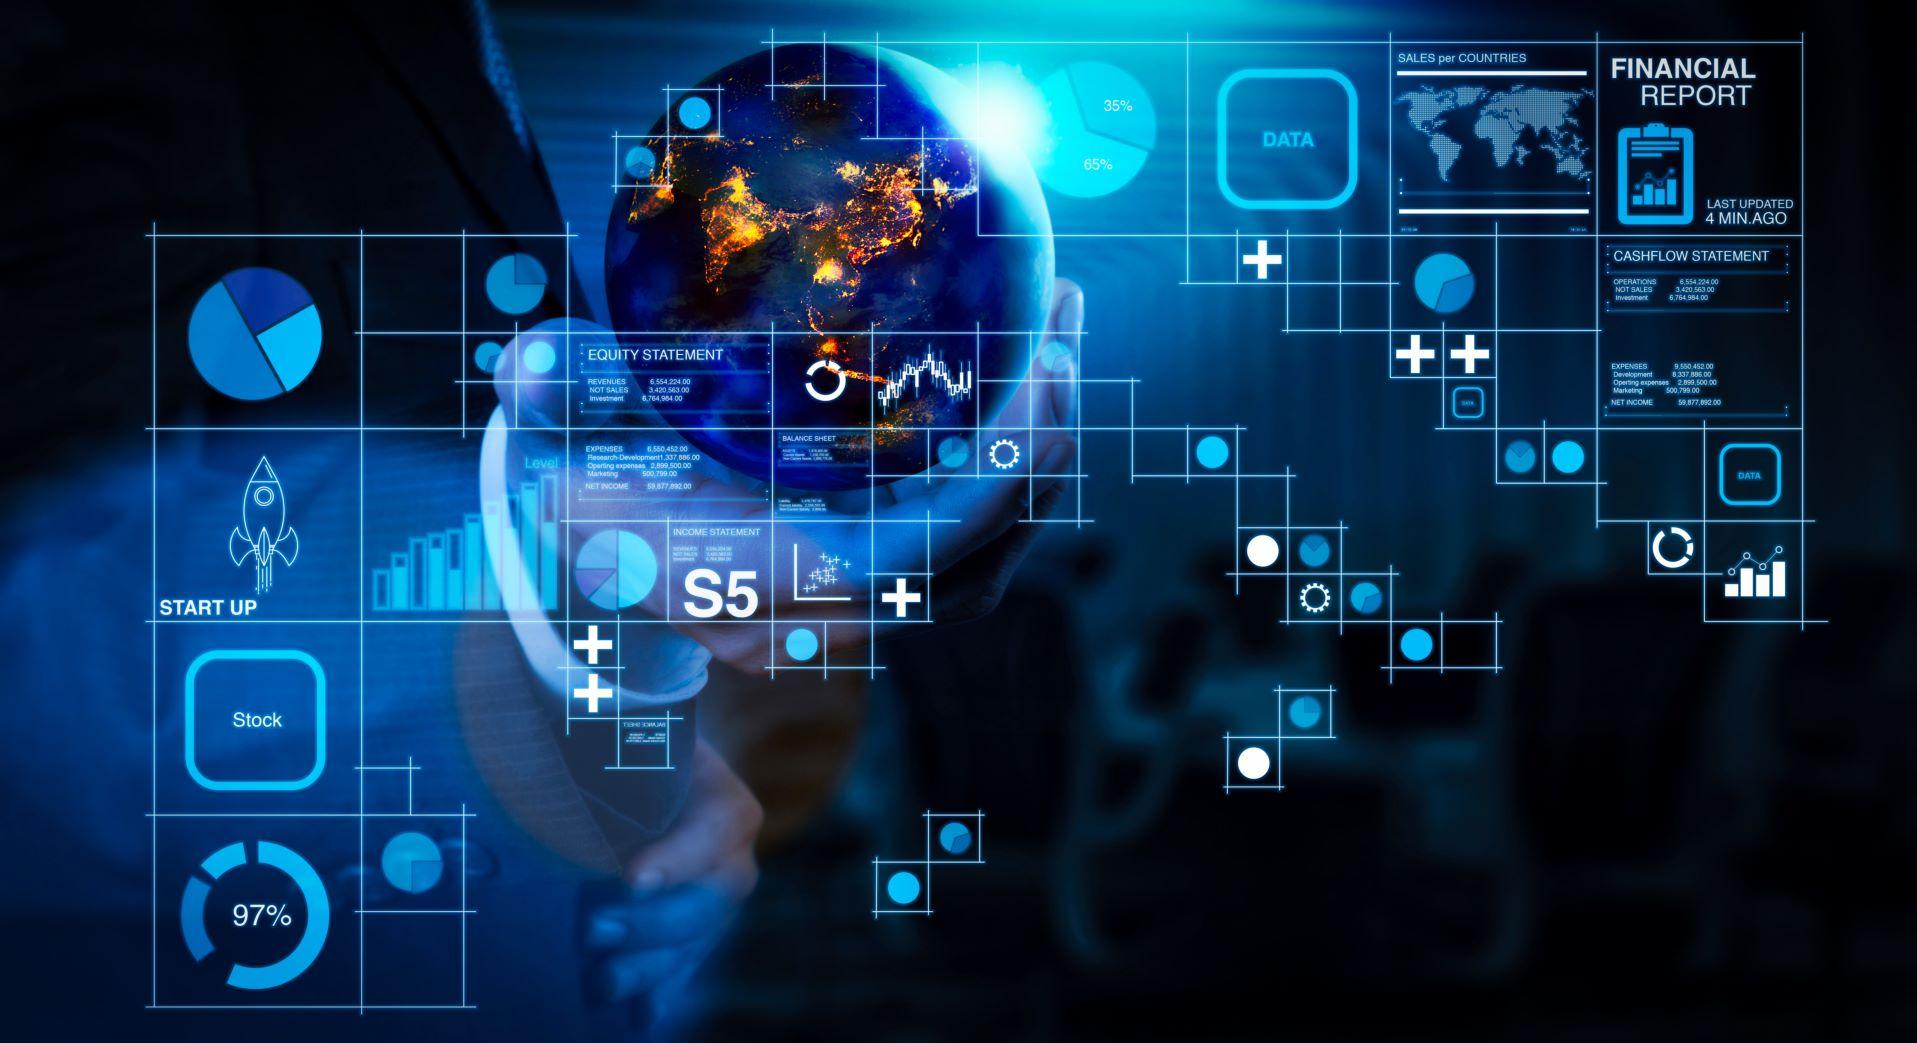 Introducing Tellimer's Emerging Market Fintech 50 portfolio